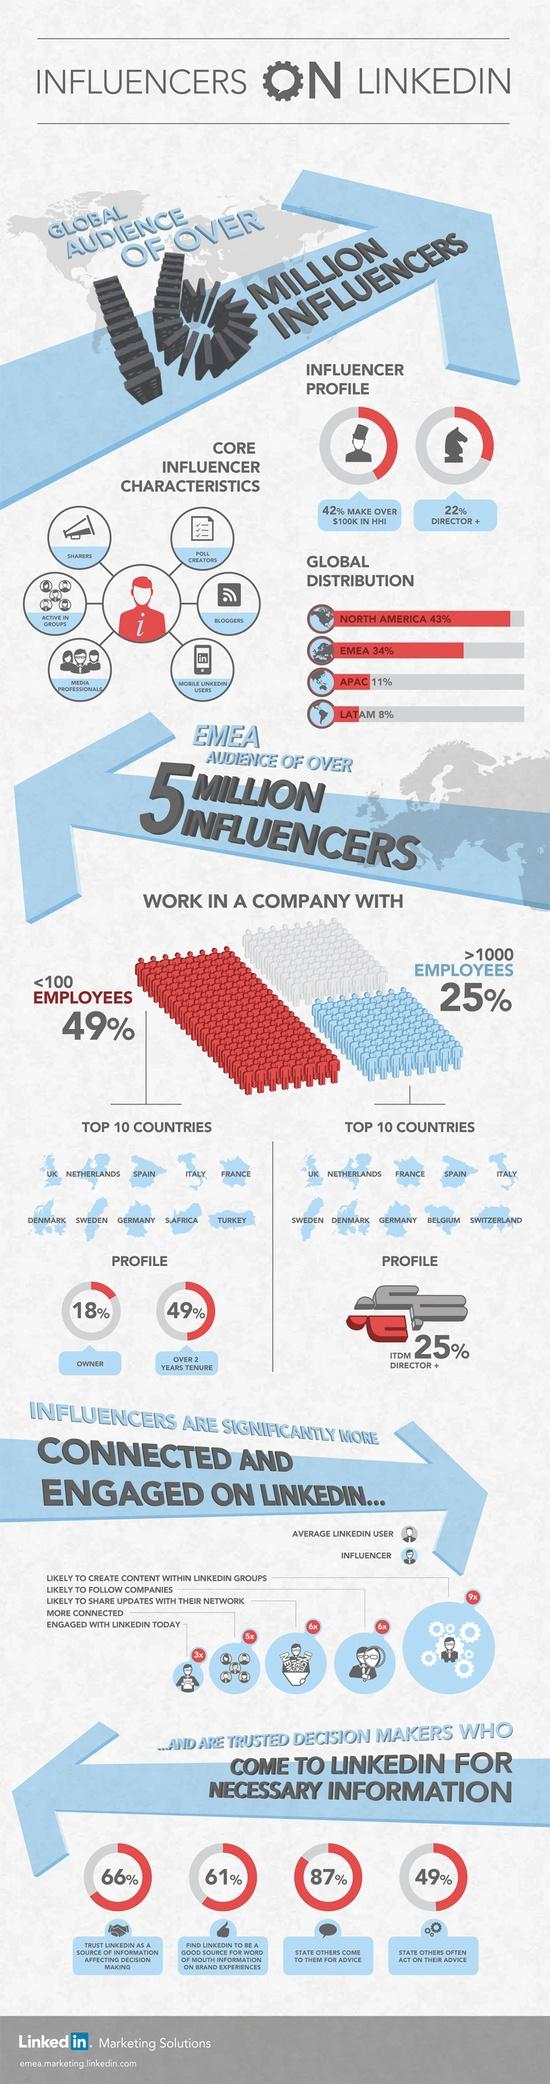 Influencers on Linkedin